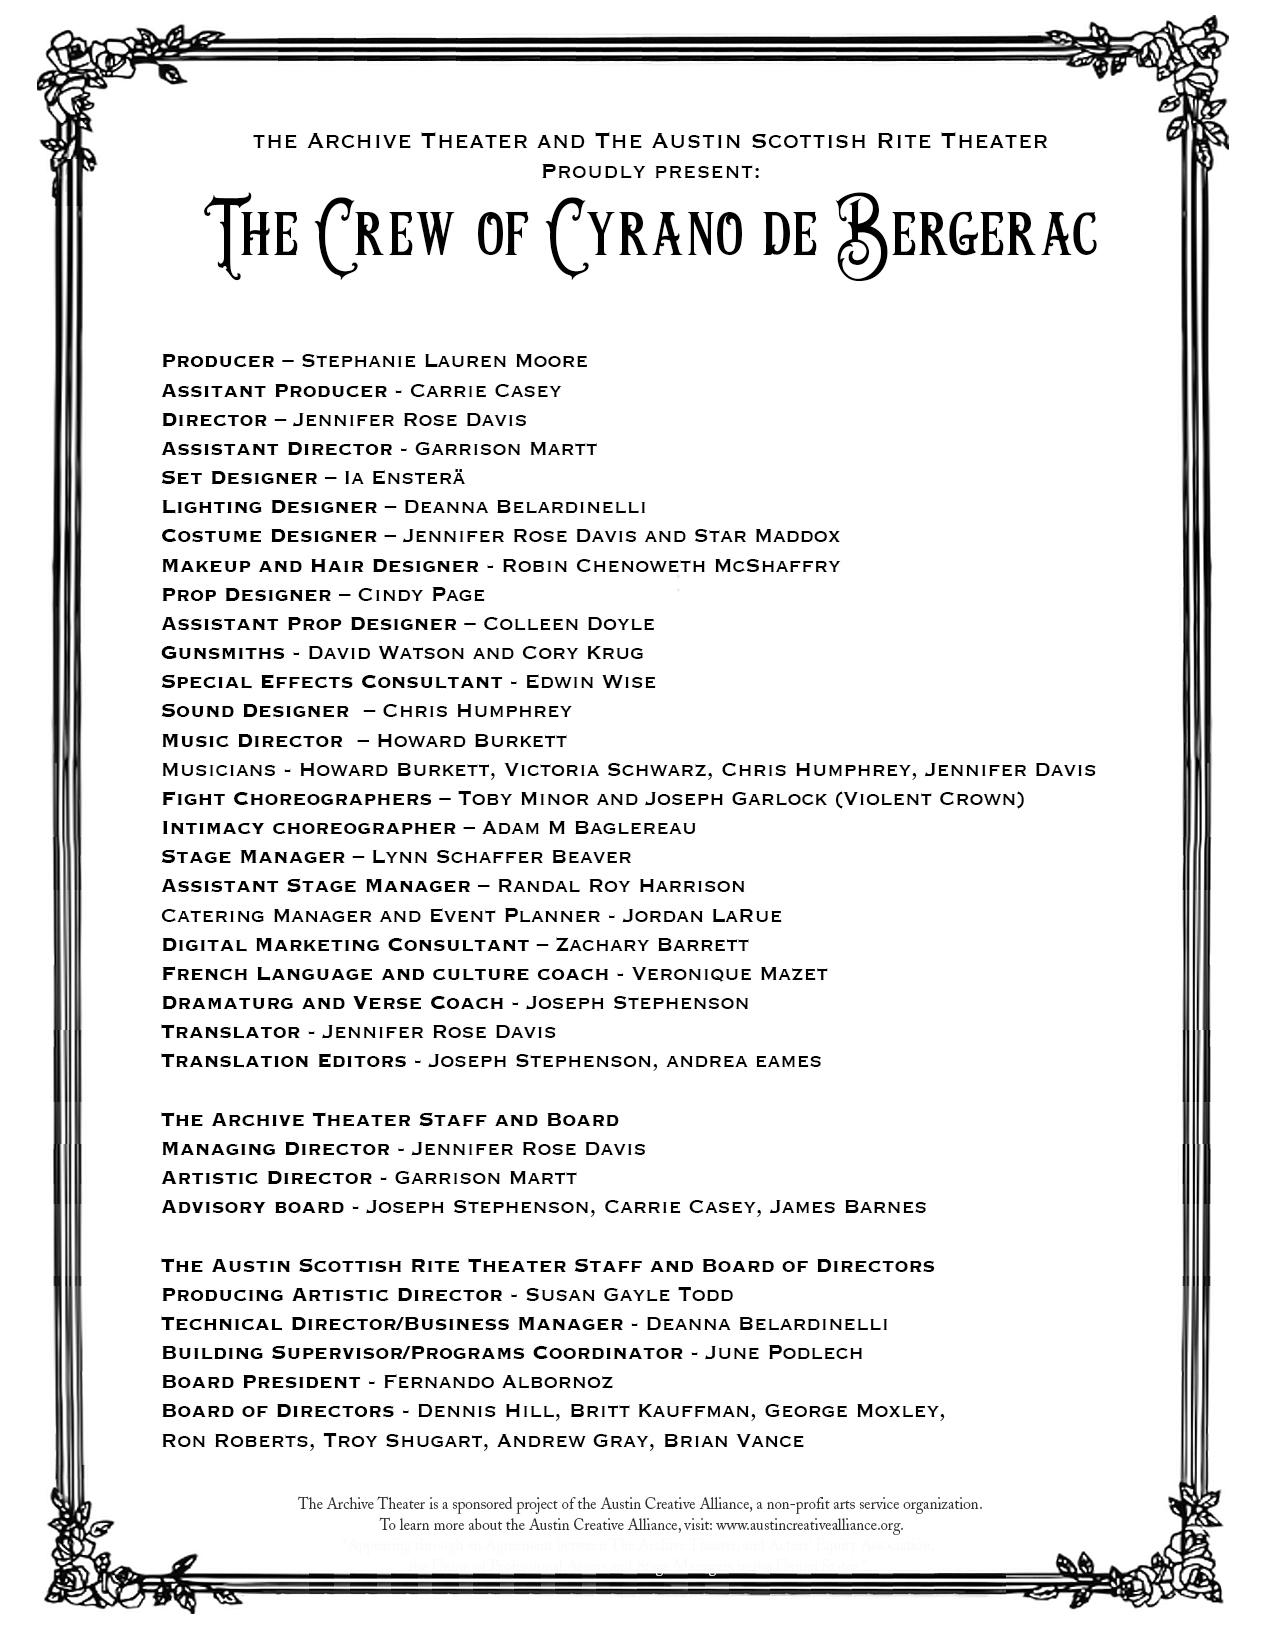 The Crew of Cyrano de Bergerac.jpg